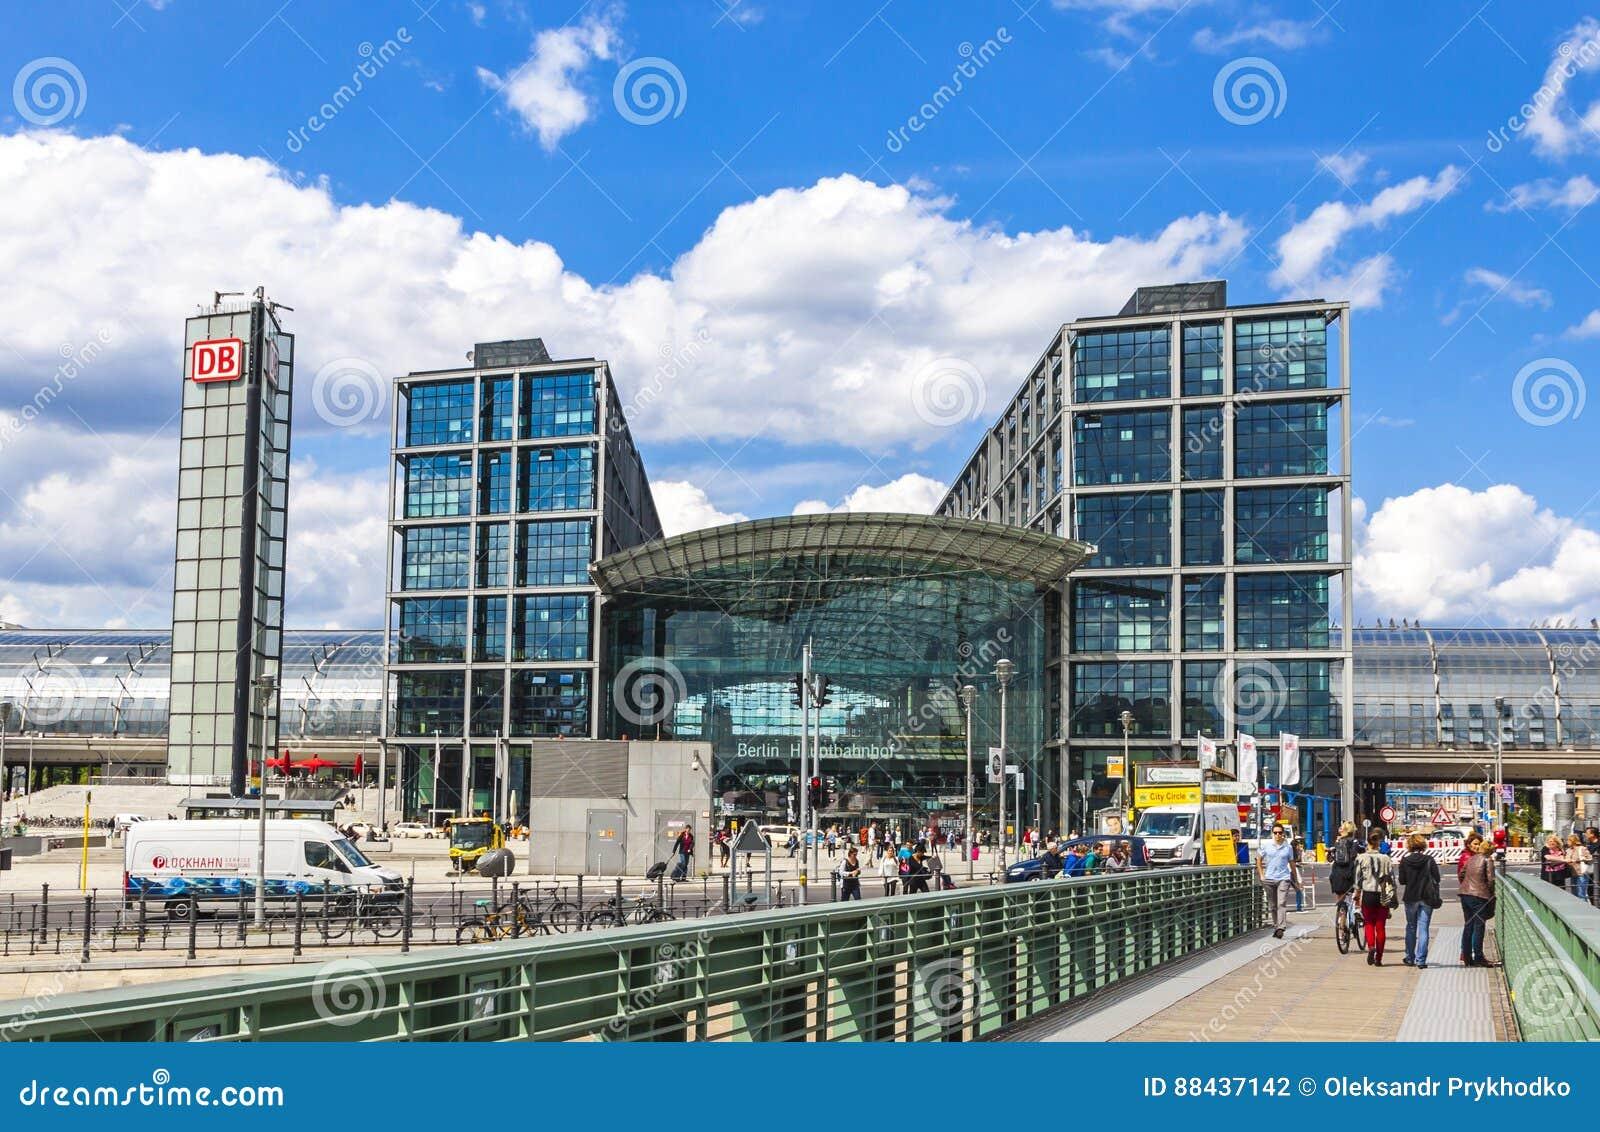 berlin central railway station berlin hauptbahnhof redactionele fotografie afbeelding 88437142. Black Bedroom Furniture Sets. Home Design Ideas